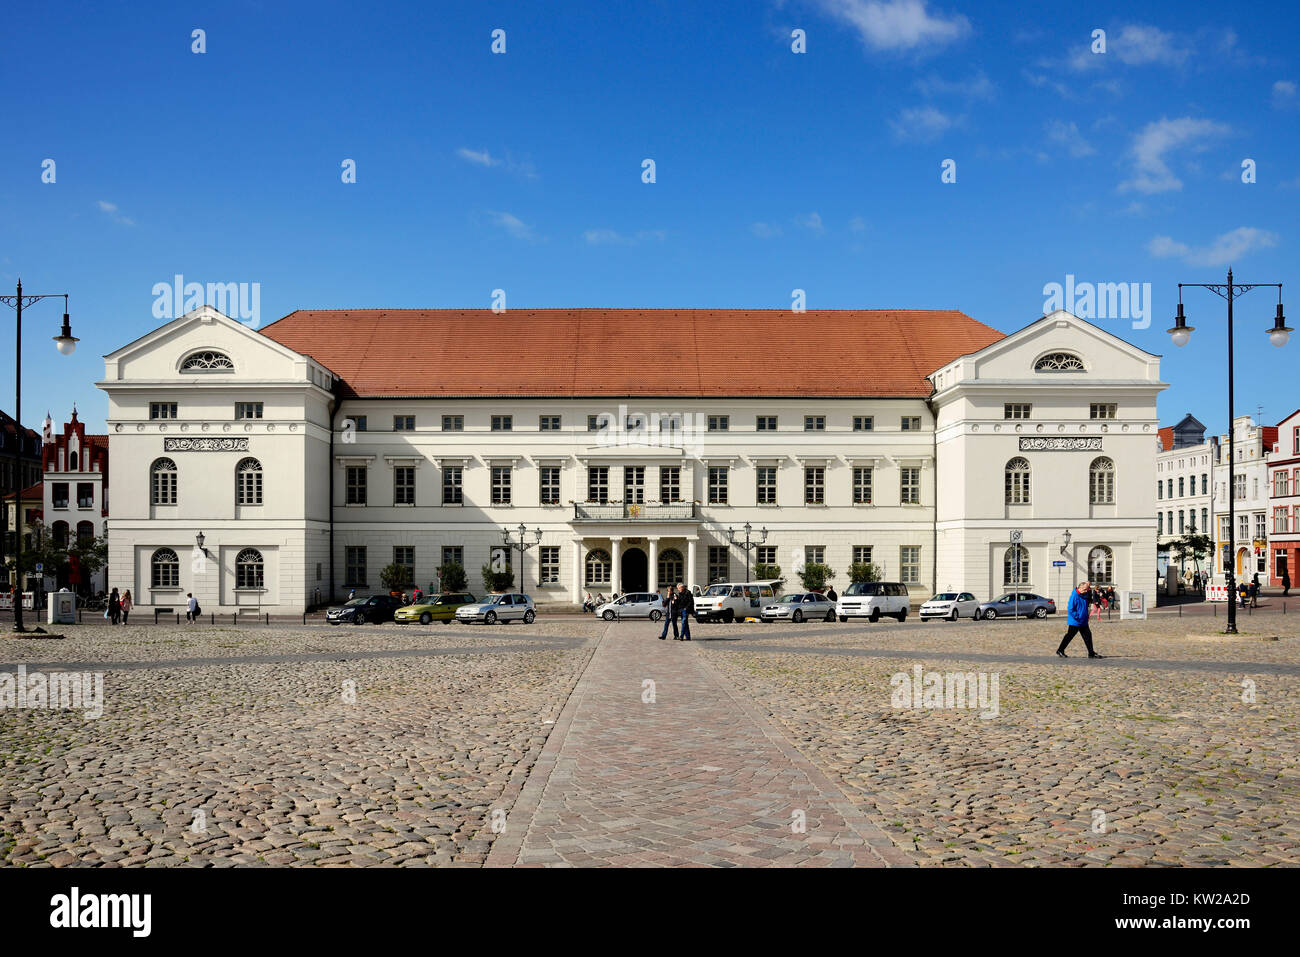 Wismar, city hall on the marketplace, Rathaus am Marktplatz - Stock Image